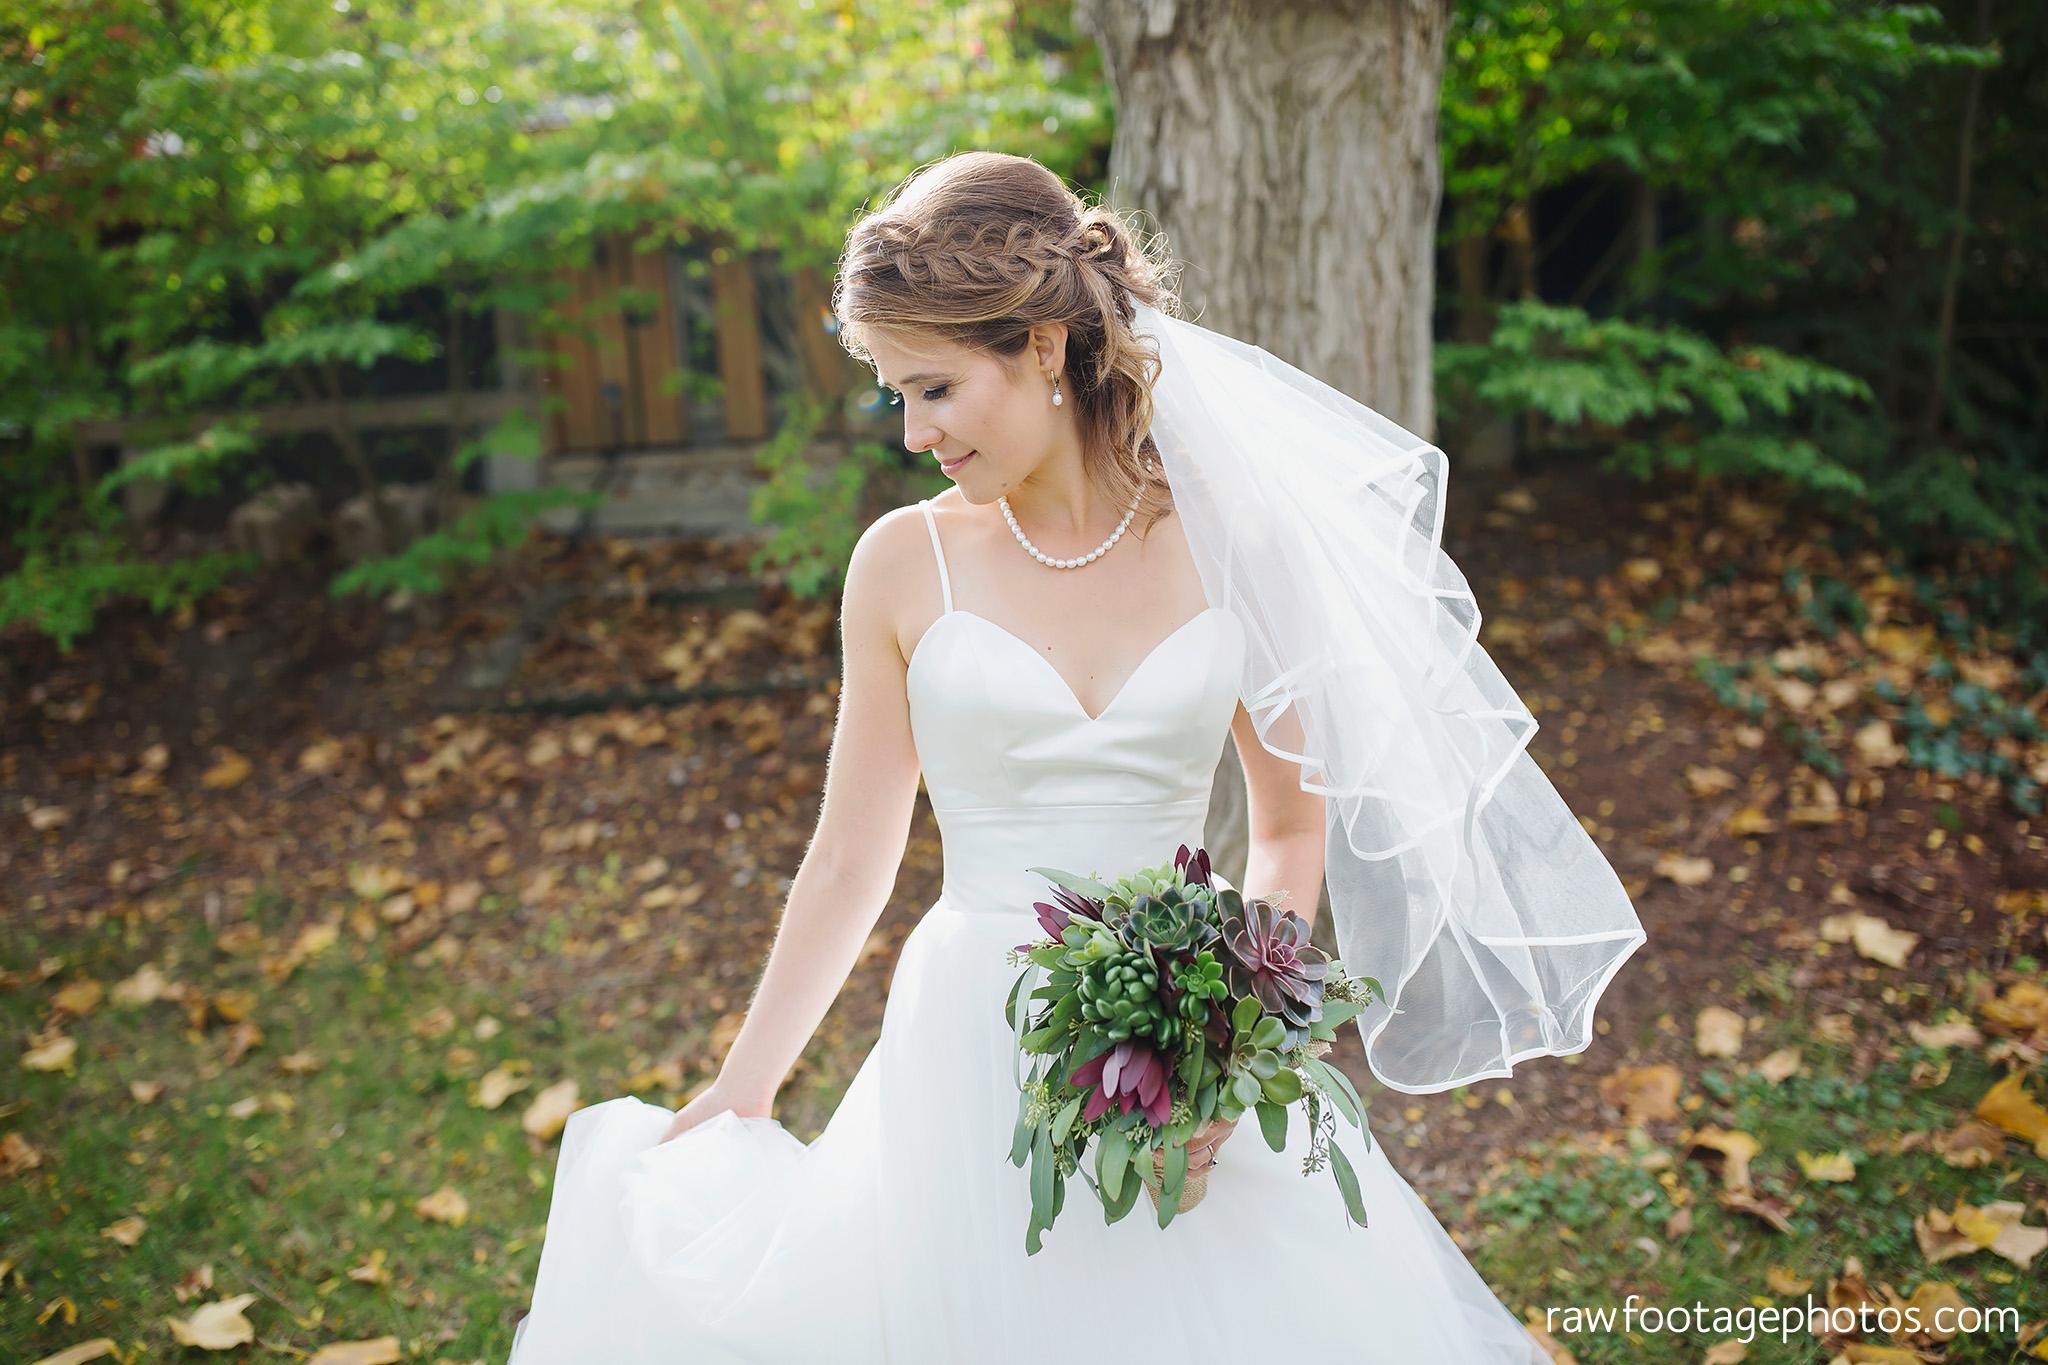 london_ontario_wedding_photographer-civic_gardens-springbank_park-succulent_bouquet-fall_wedding-bridge-raw_footage_photography014.jpg